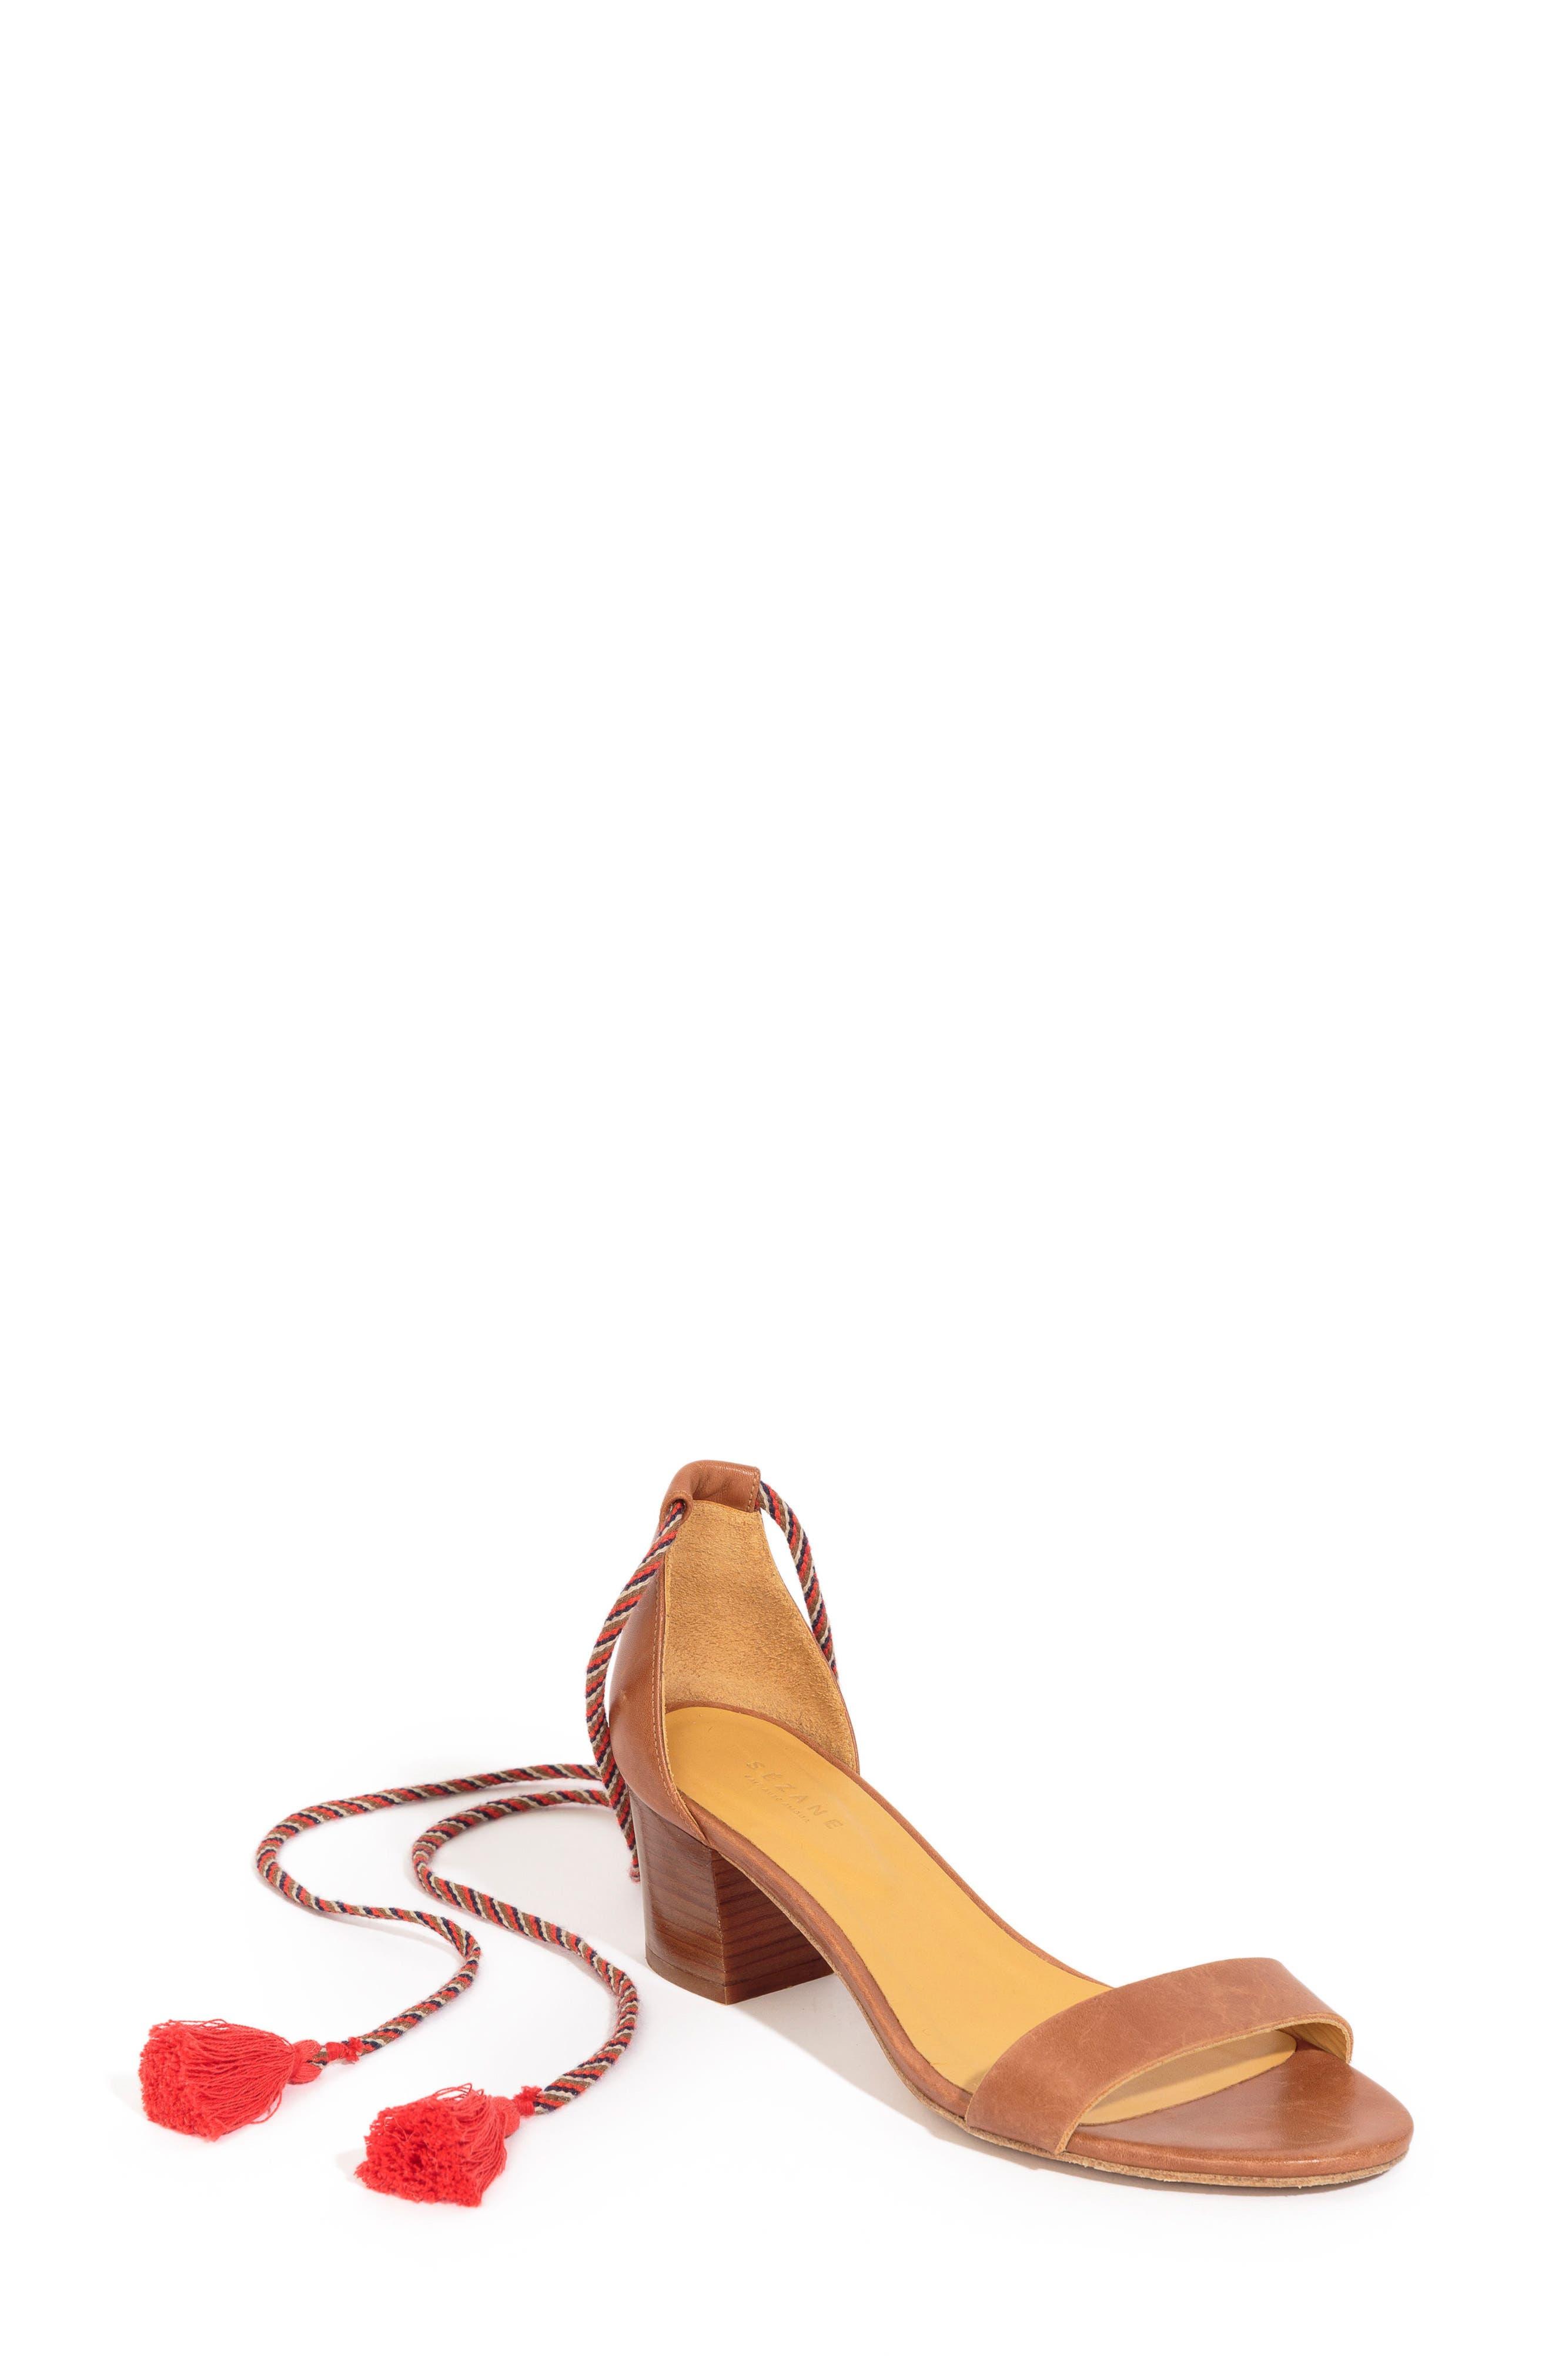 Lorenzo Ankle Wrap Block Heel Sandal,                             Main thumbnail 1, color,                             CAMEL LEATHER